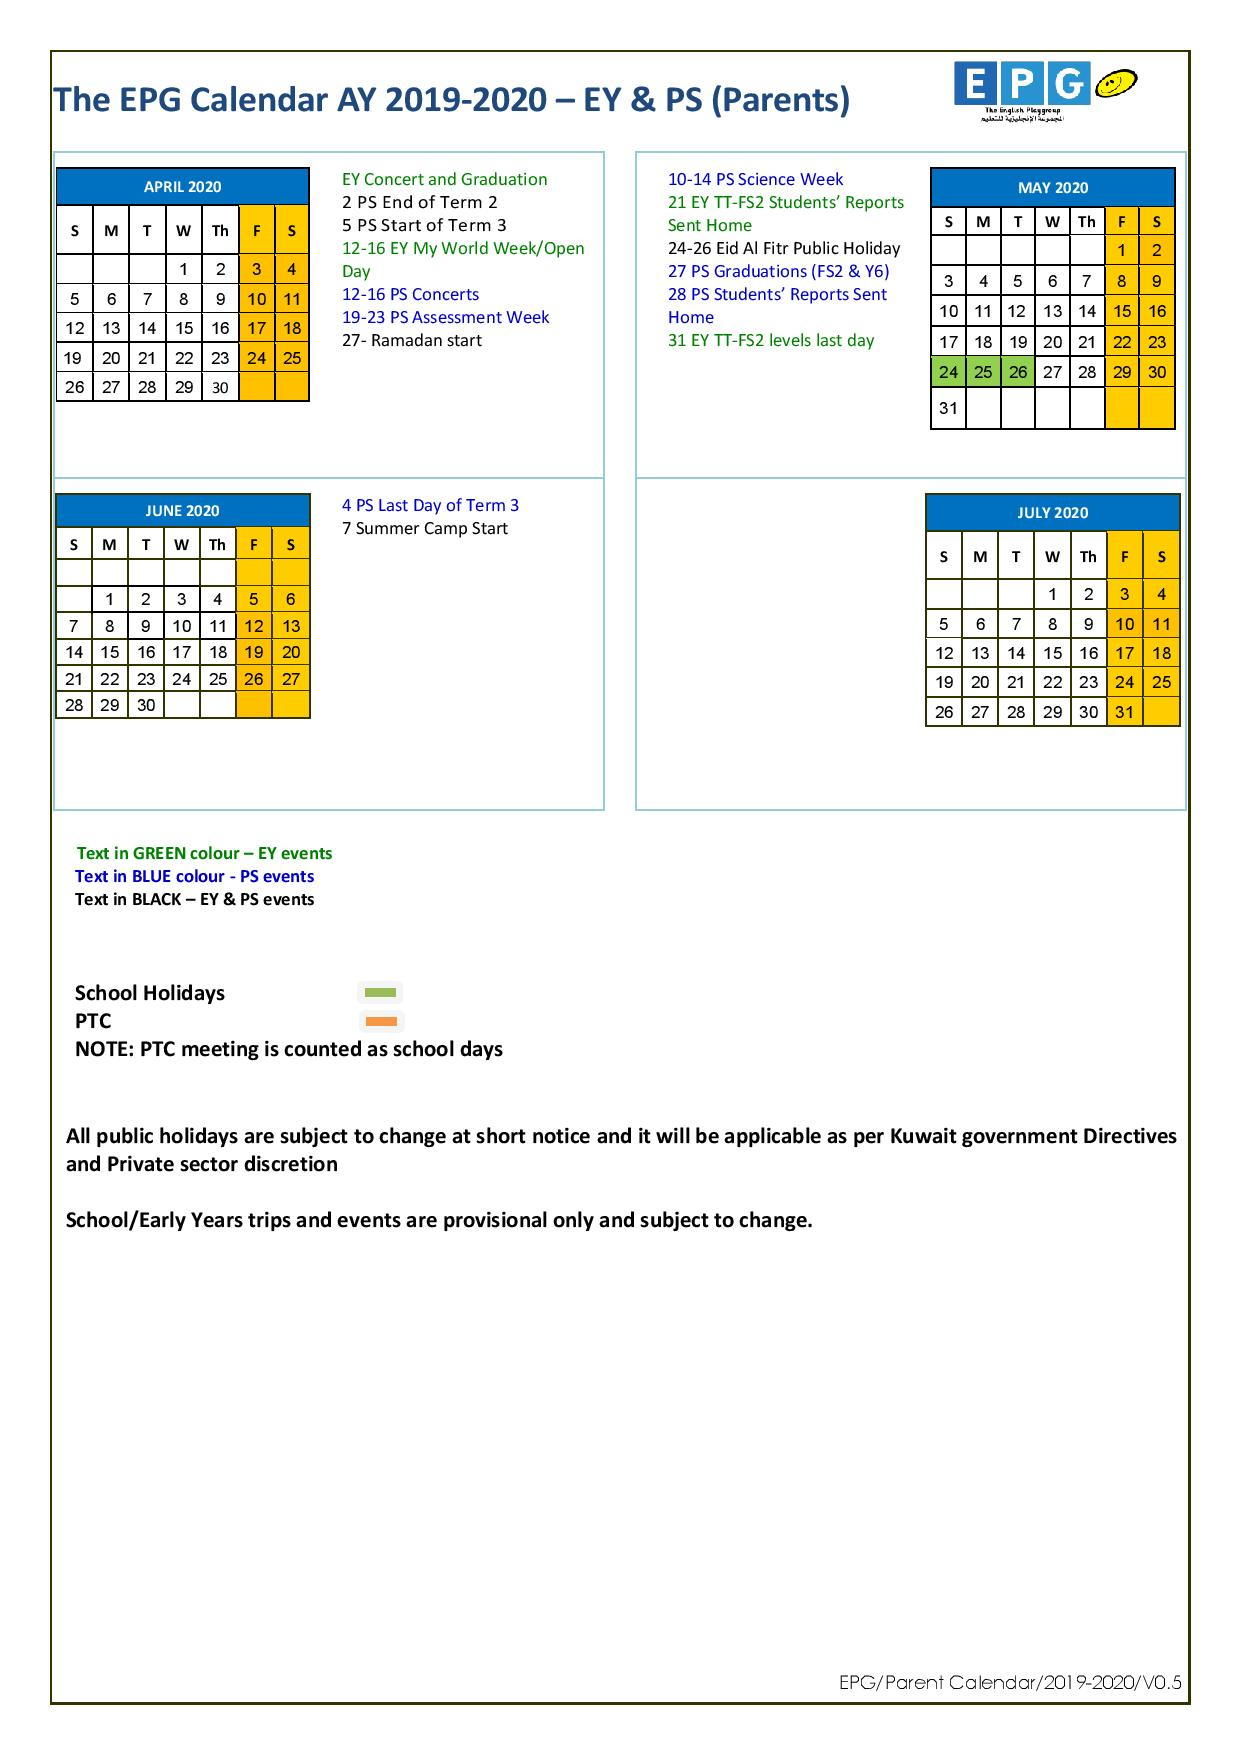 Epg-School-Calendar-Ay-2019-2020-V0.5-Parents-Page-002 - Epg